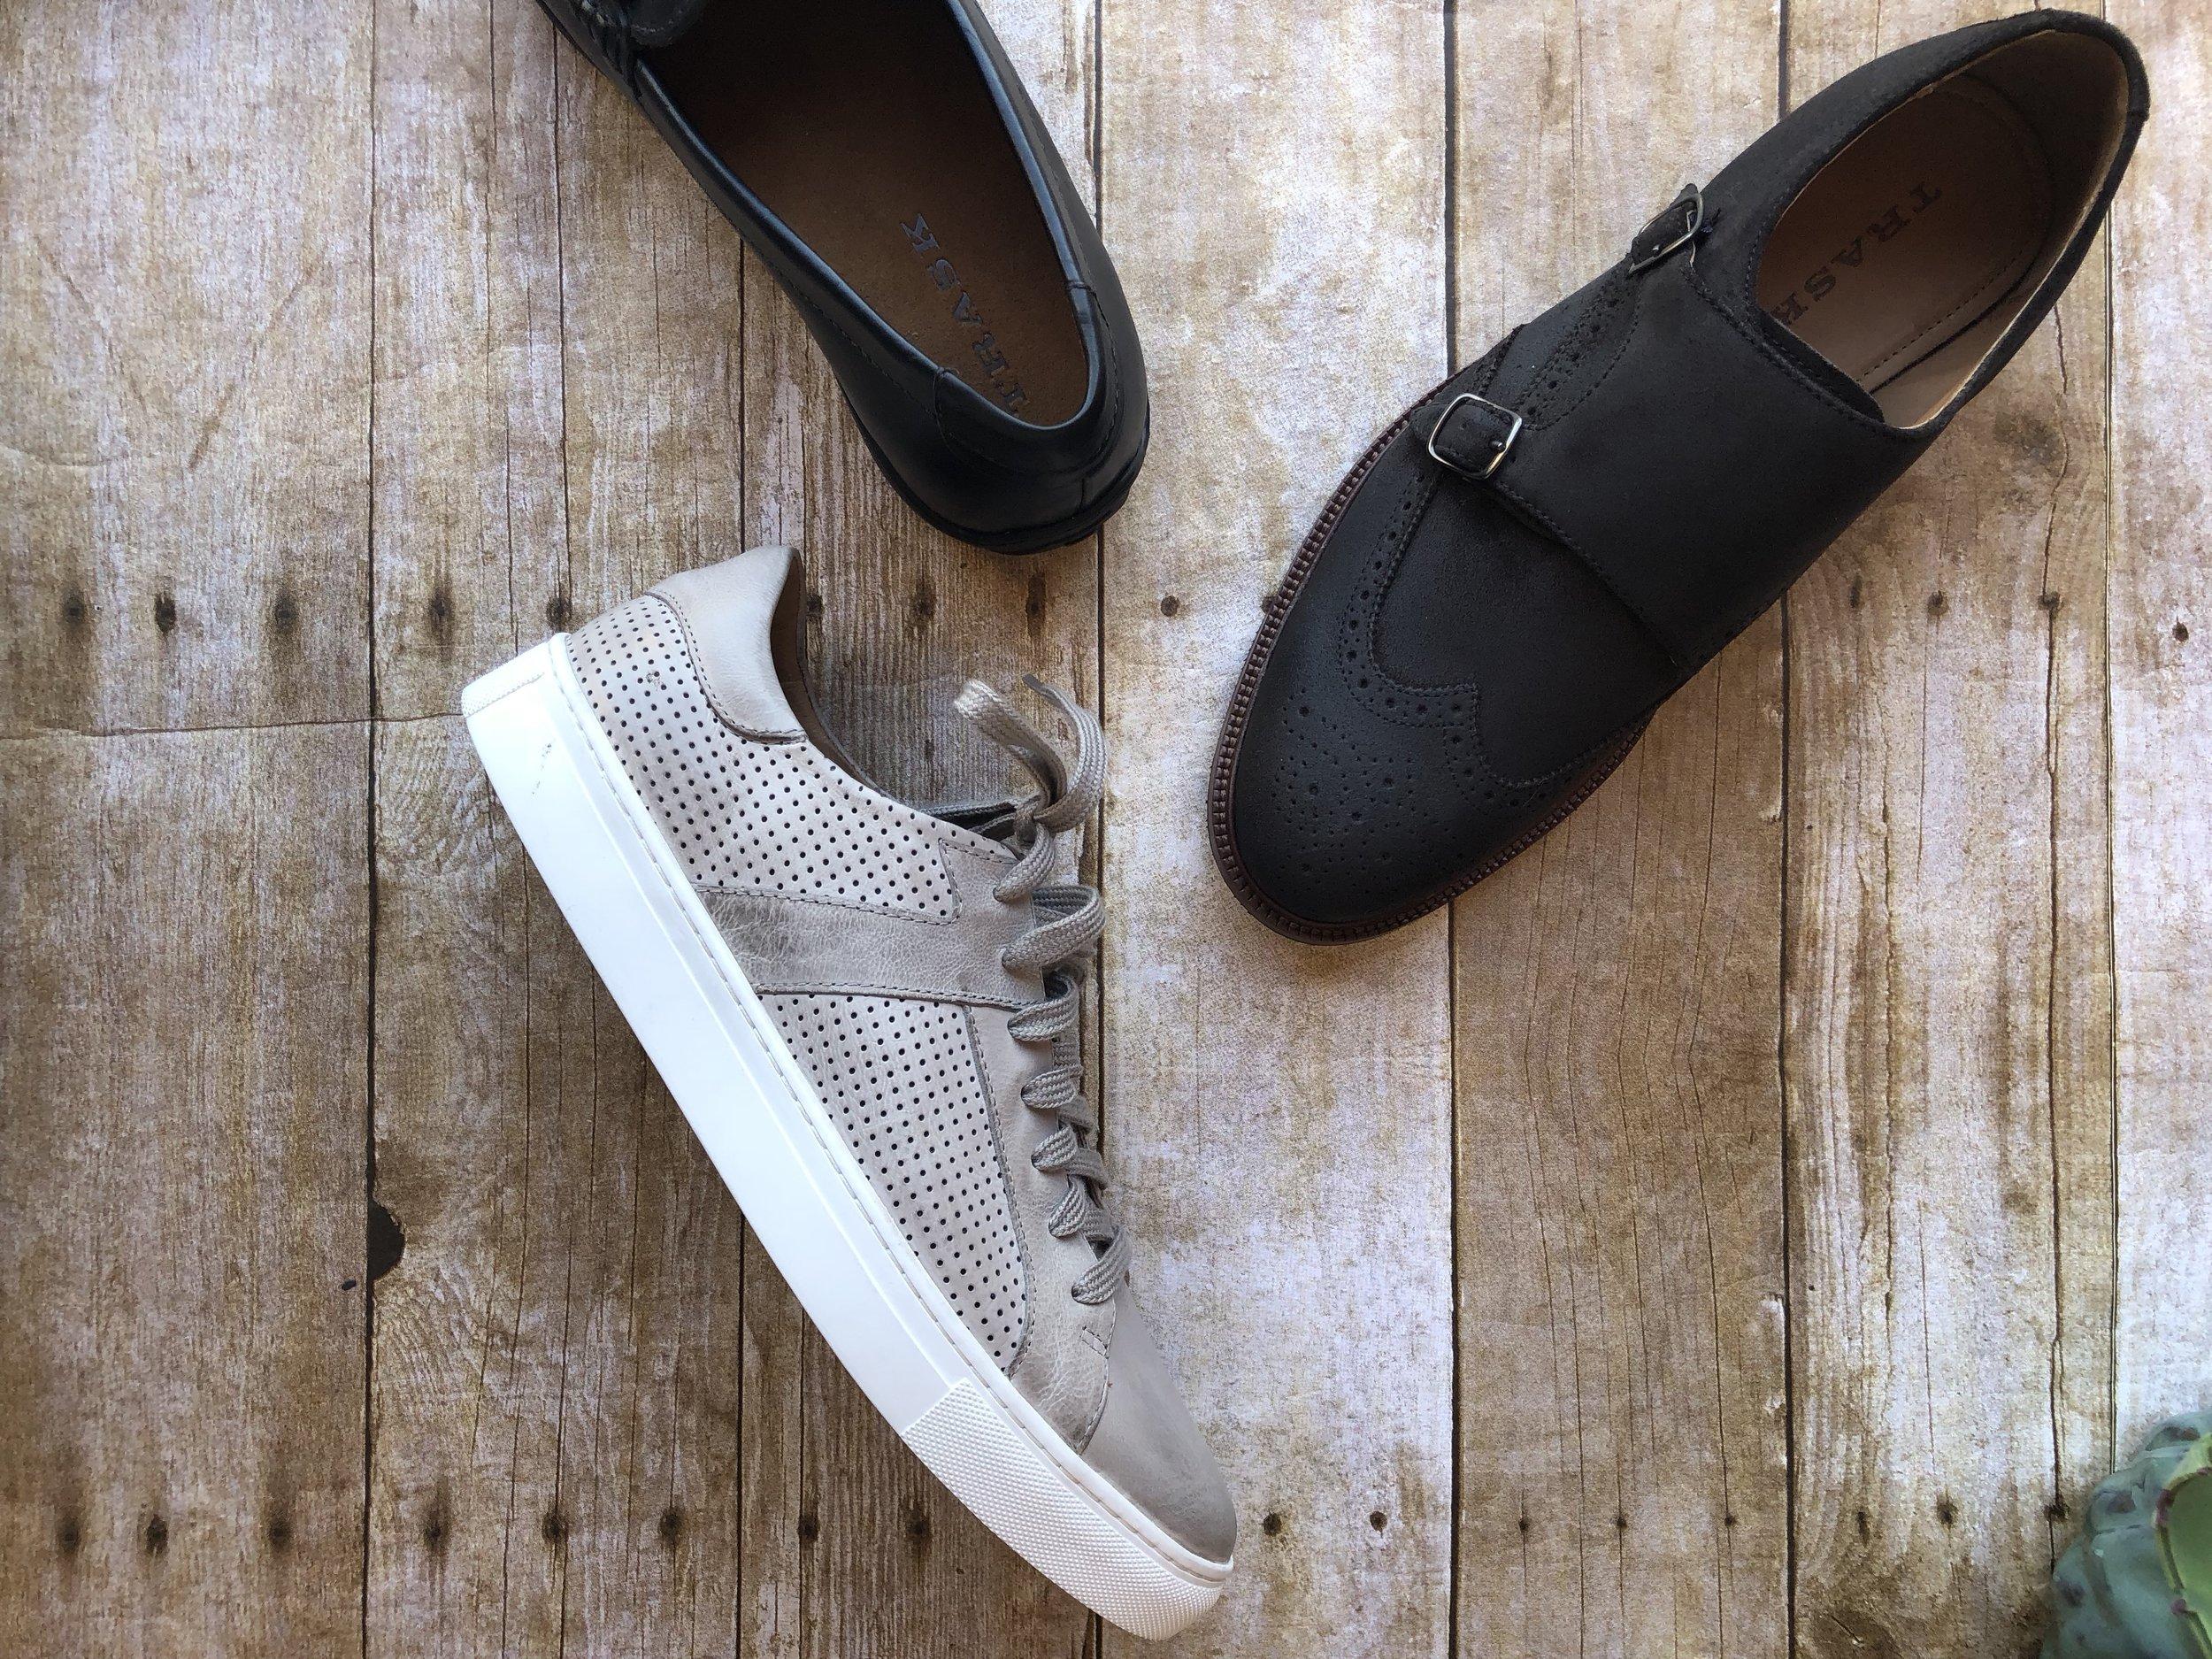 stylish-mens-shoes.JPG